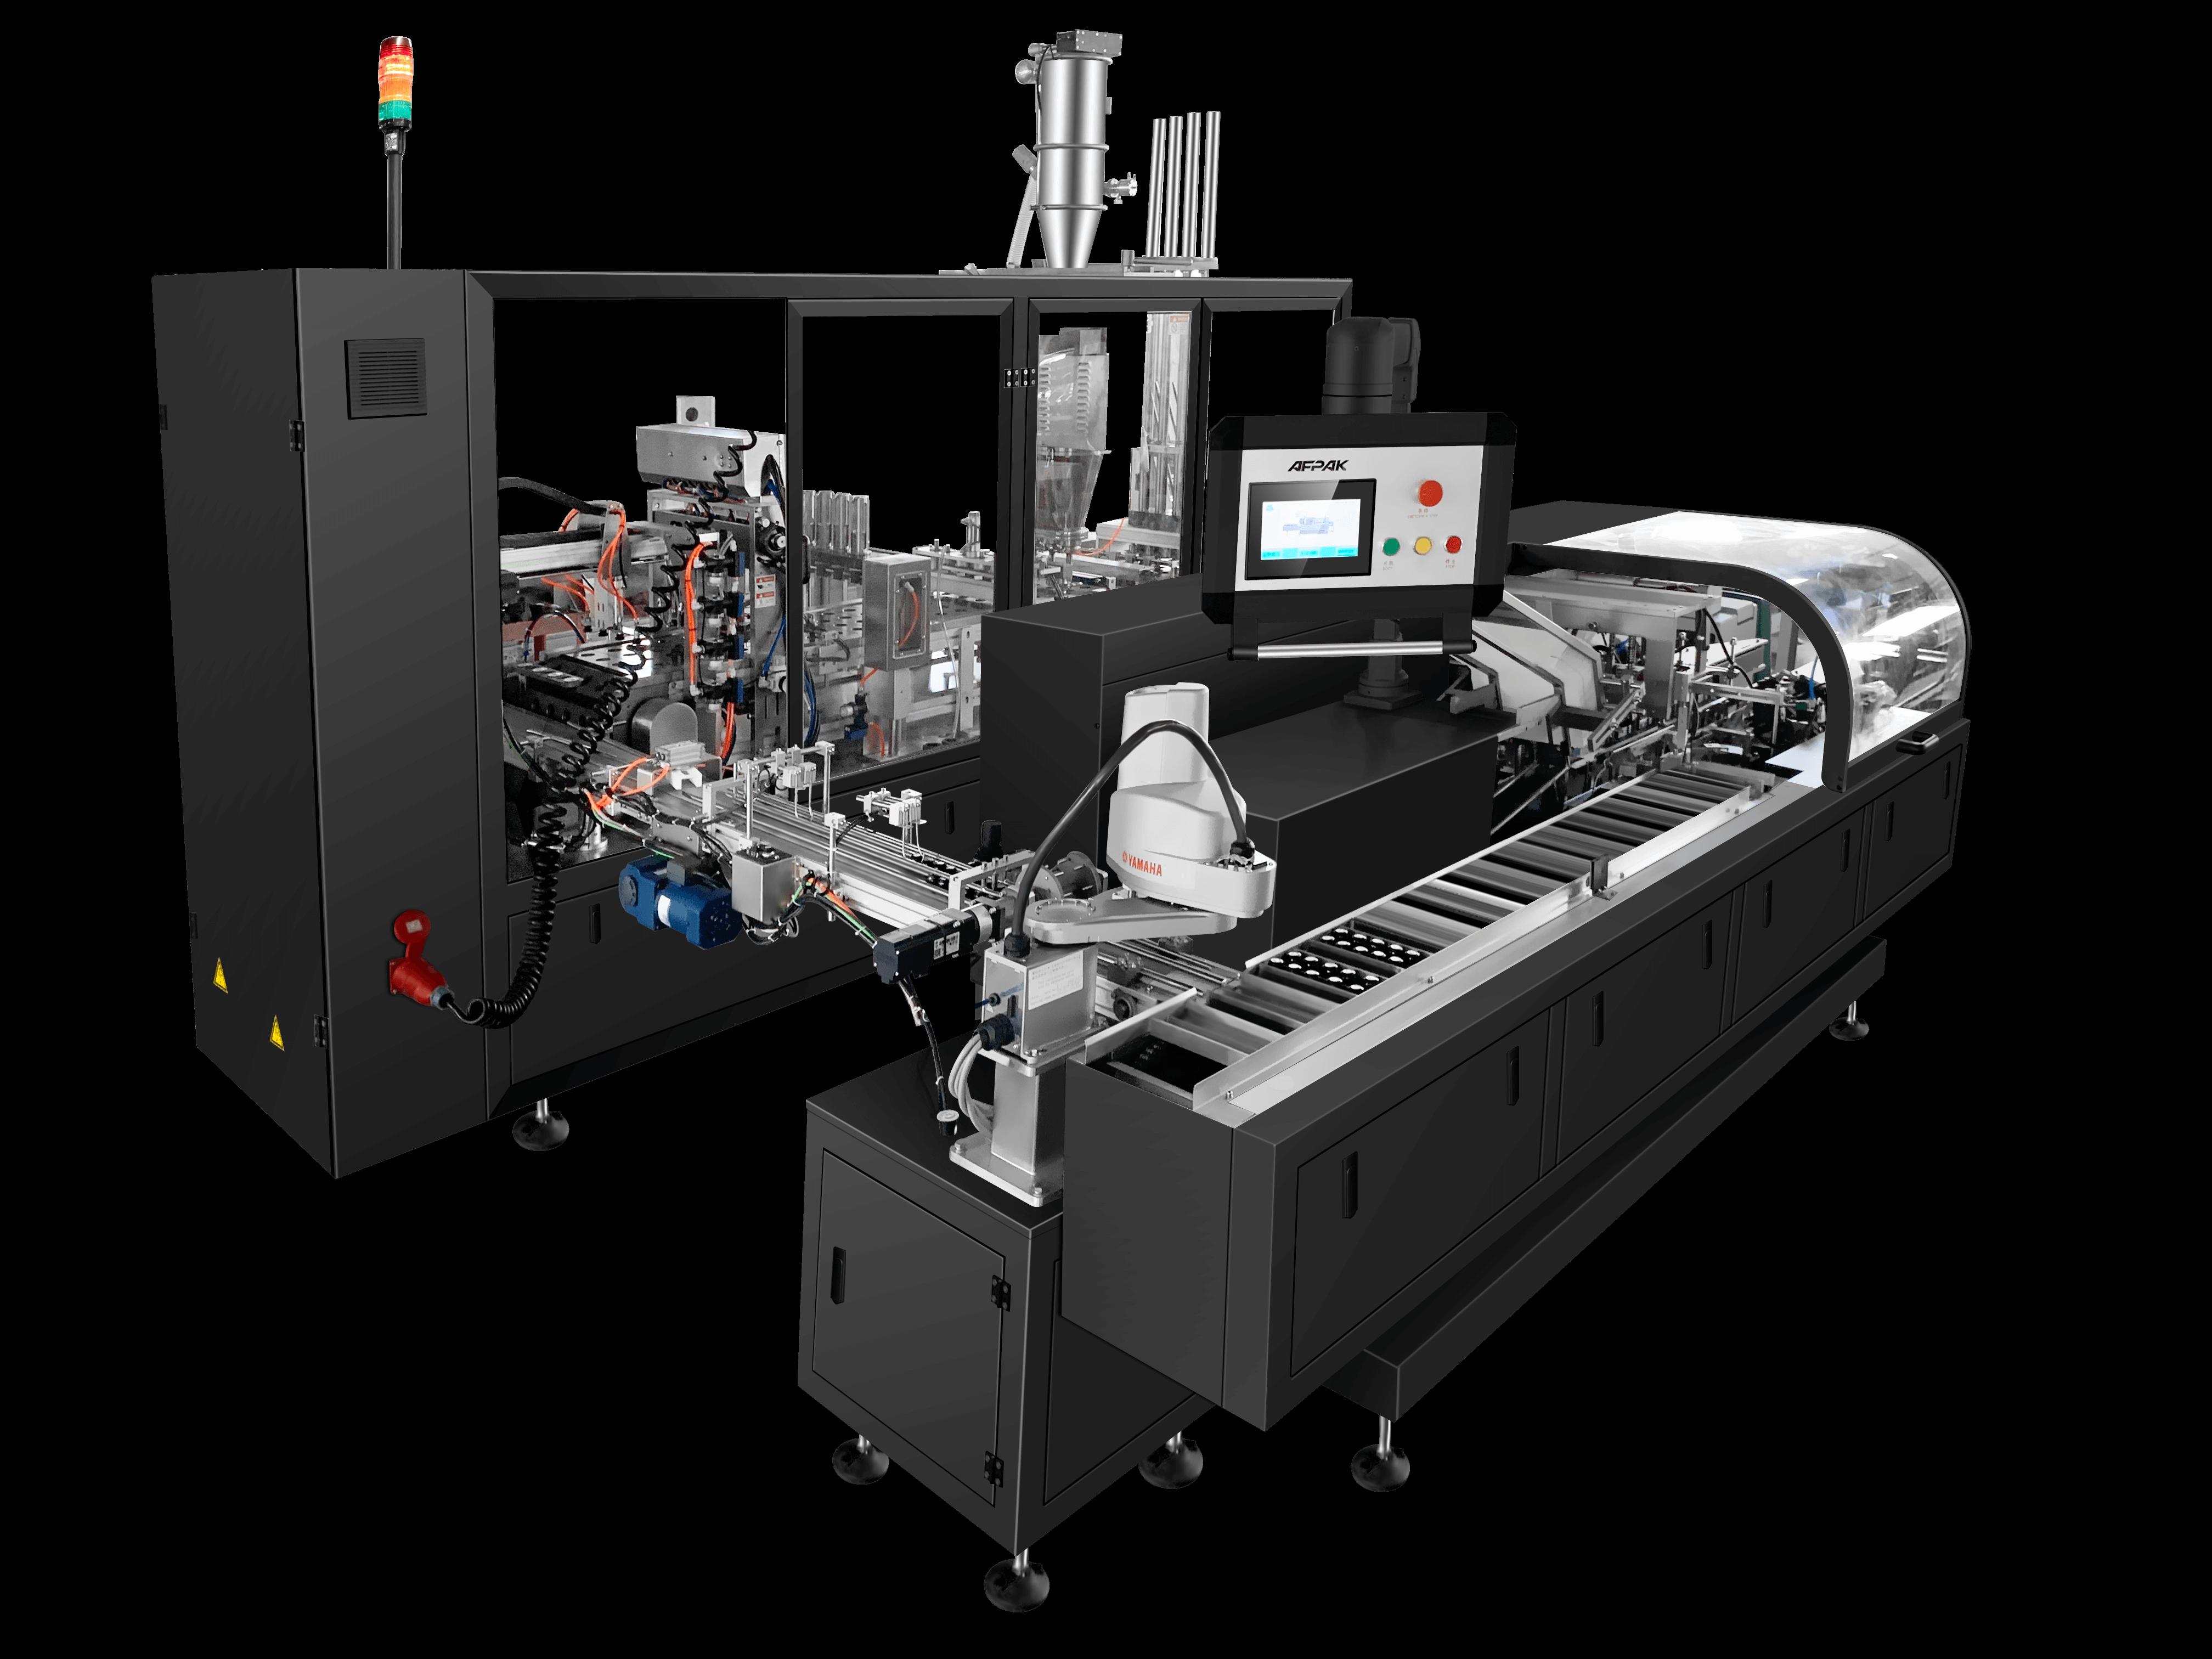 Nespresso filling sealing carton packaging machine